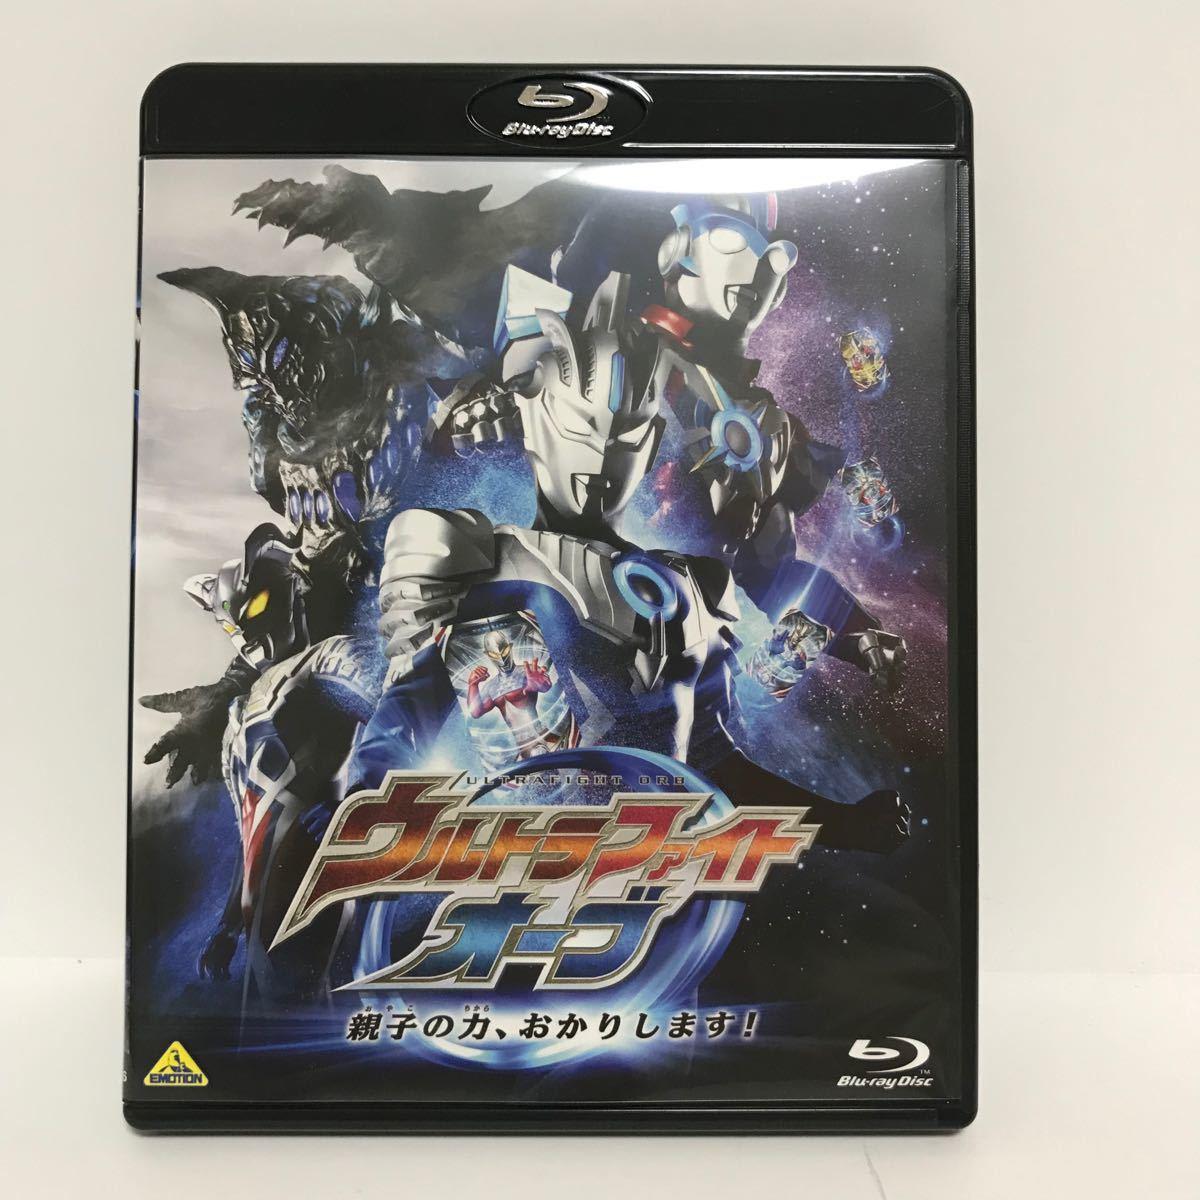 Blu-ray Disc ウルトラファイトオーブ 親子の力、おかりします! Blu-ray限定版 DX